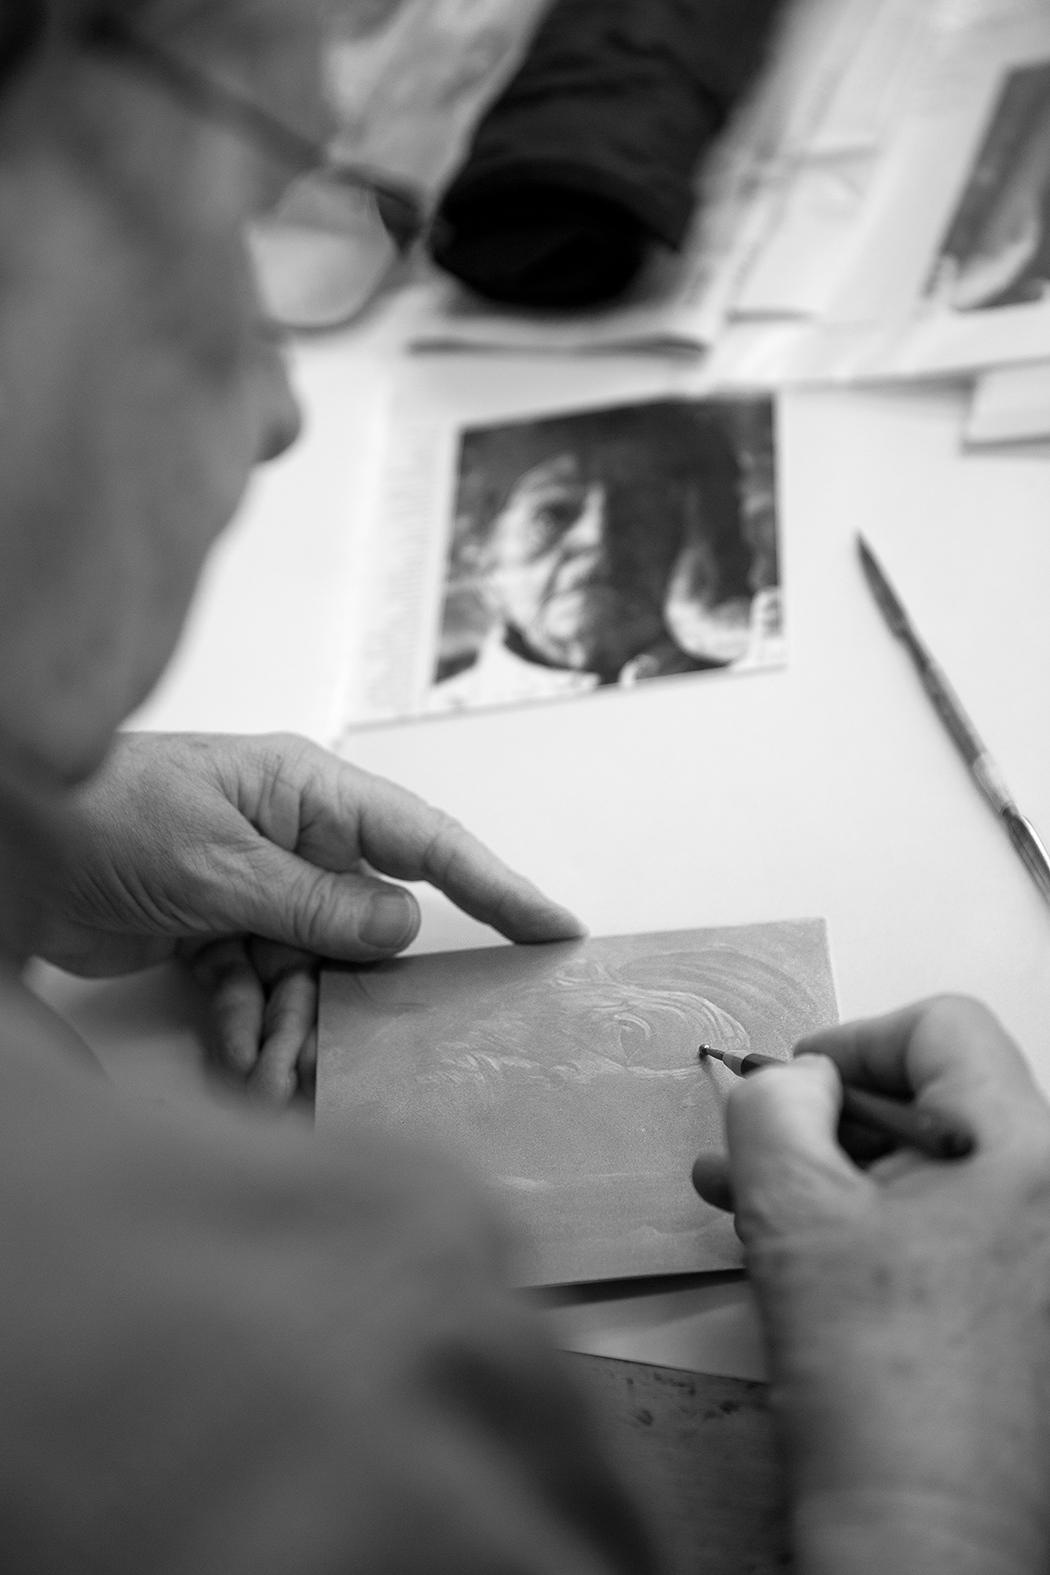 Rueedi-Luca-Portrait-Heinz-Rueedi-Kuenstler-02.jpg